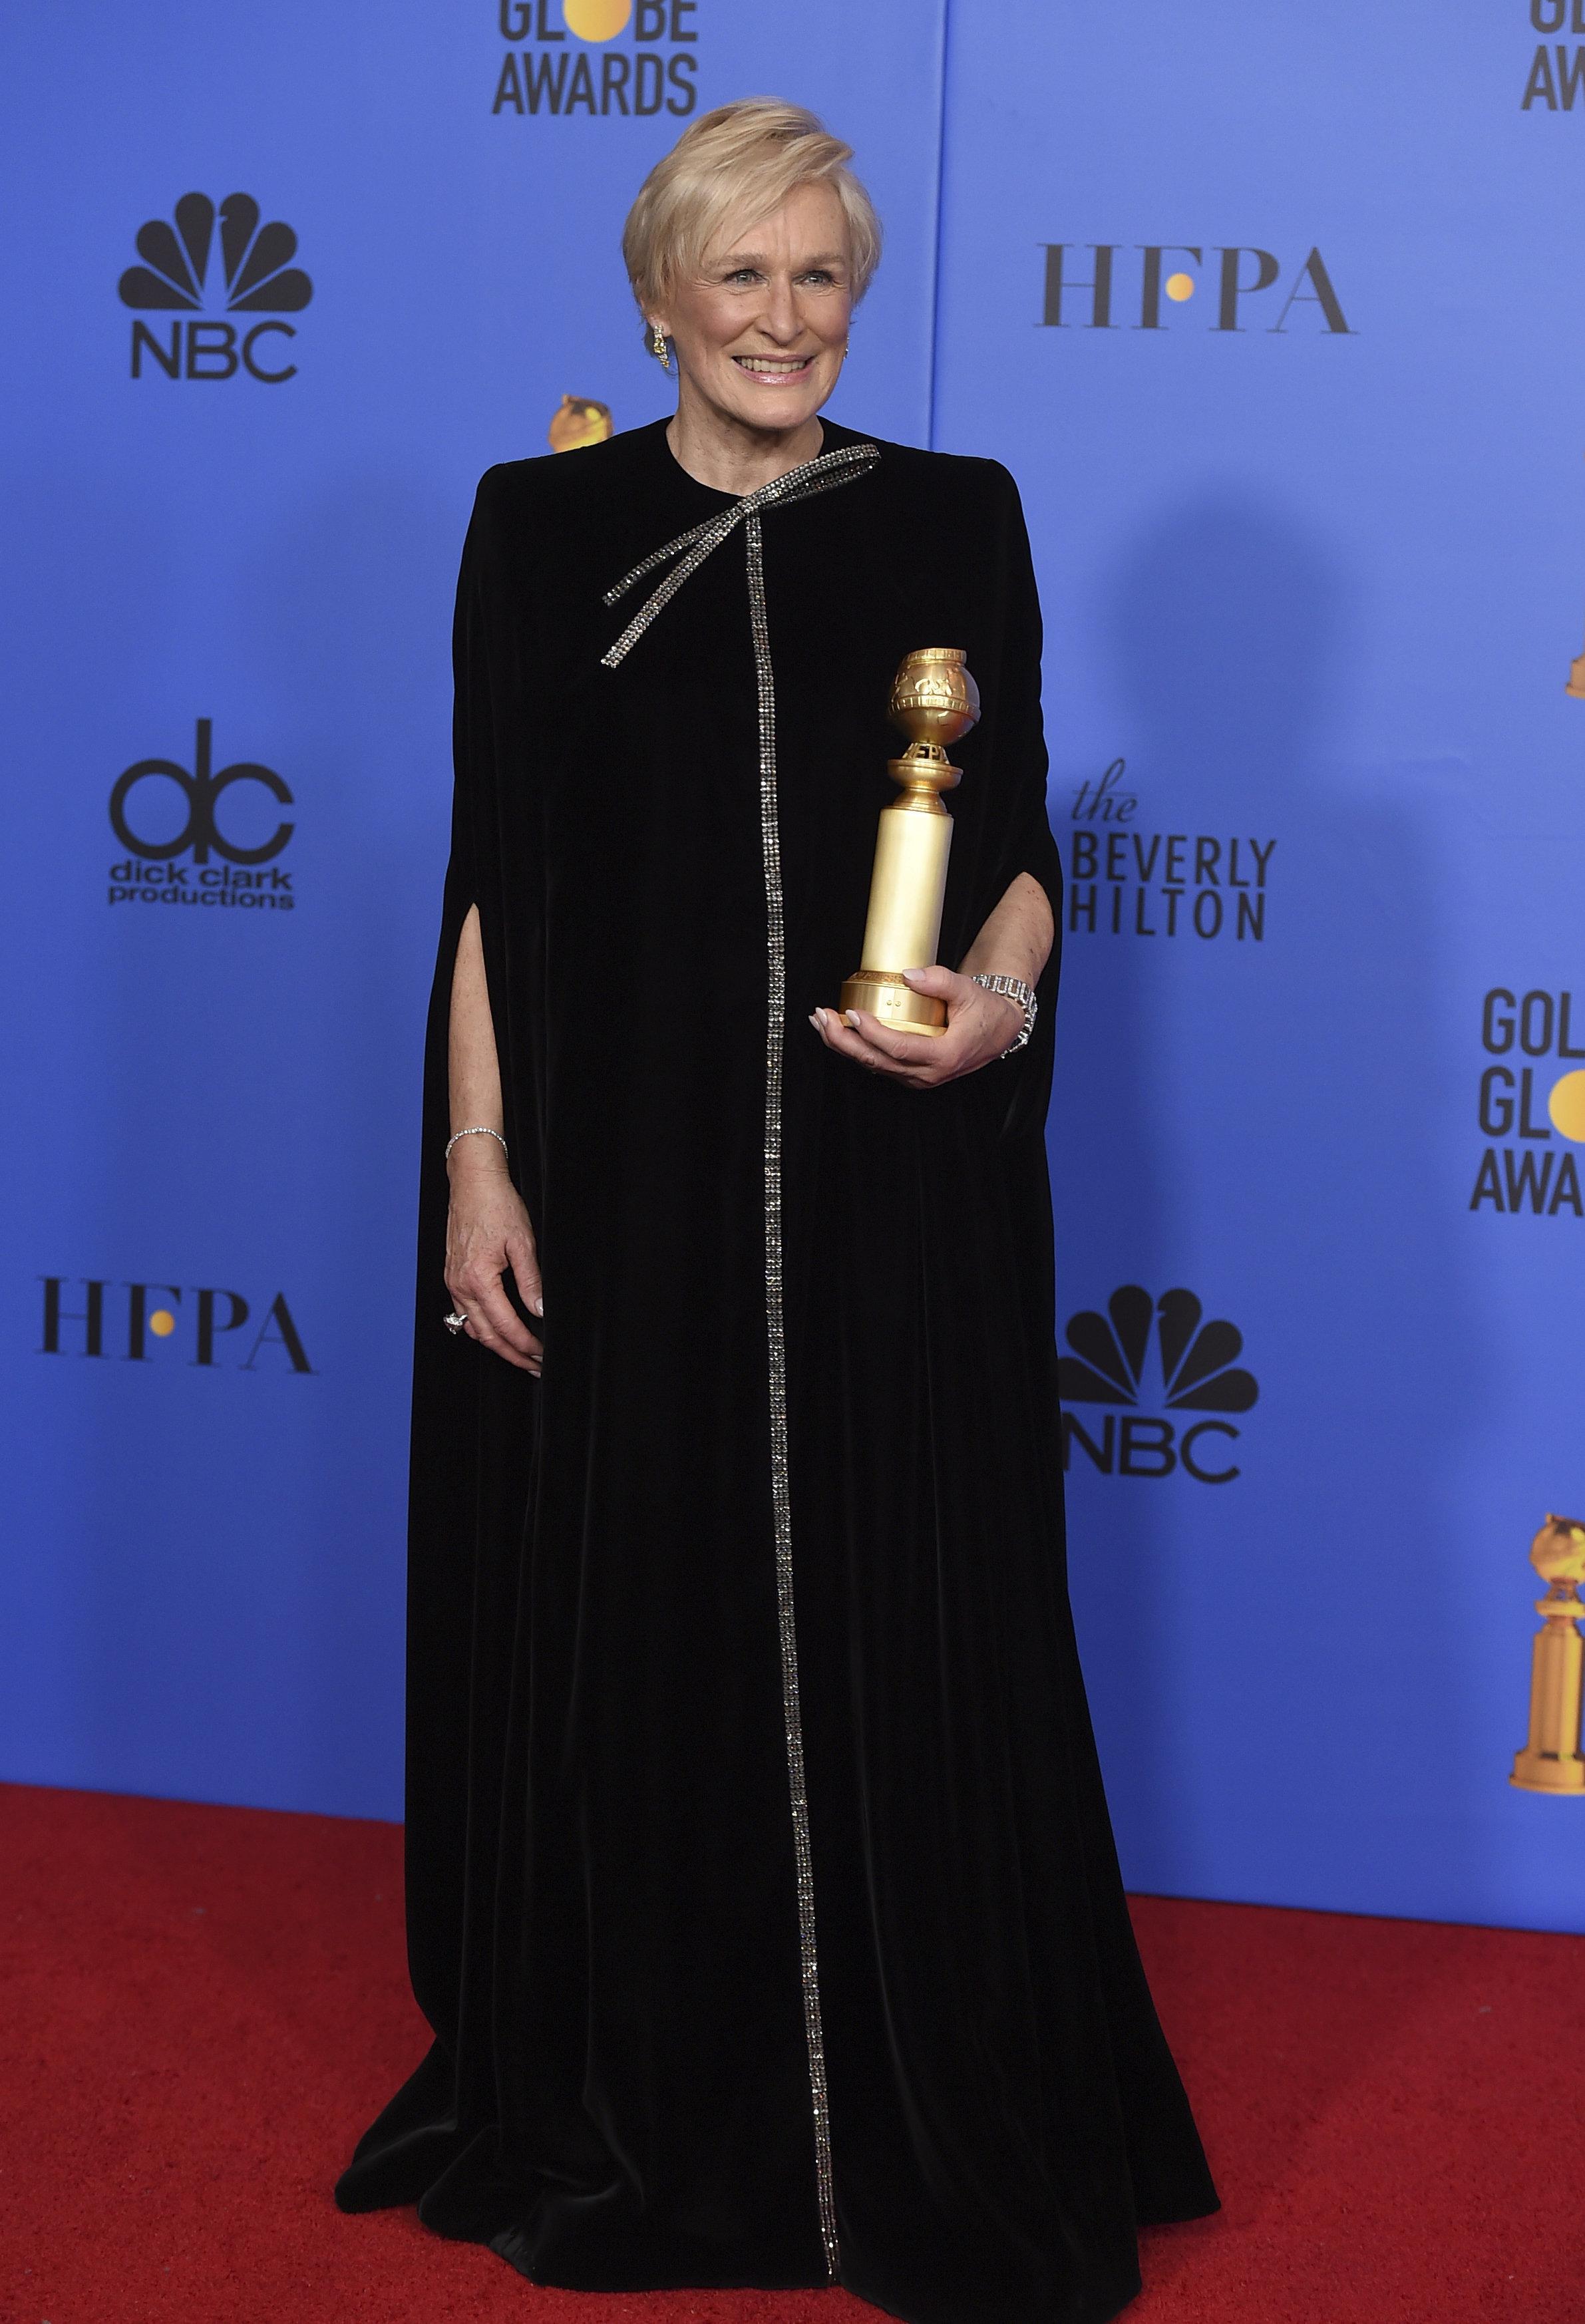 Actor Glenn Close's Empowering Golden Globes